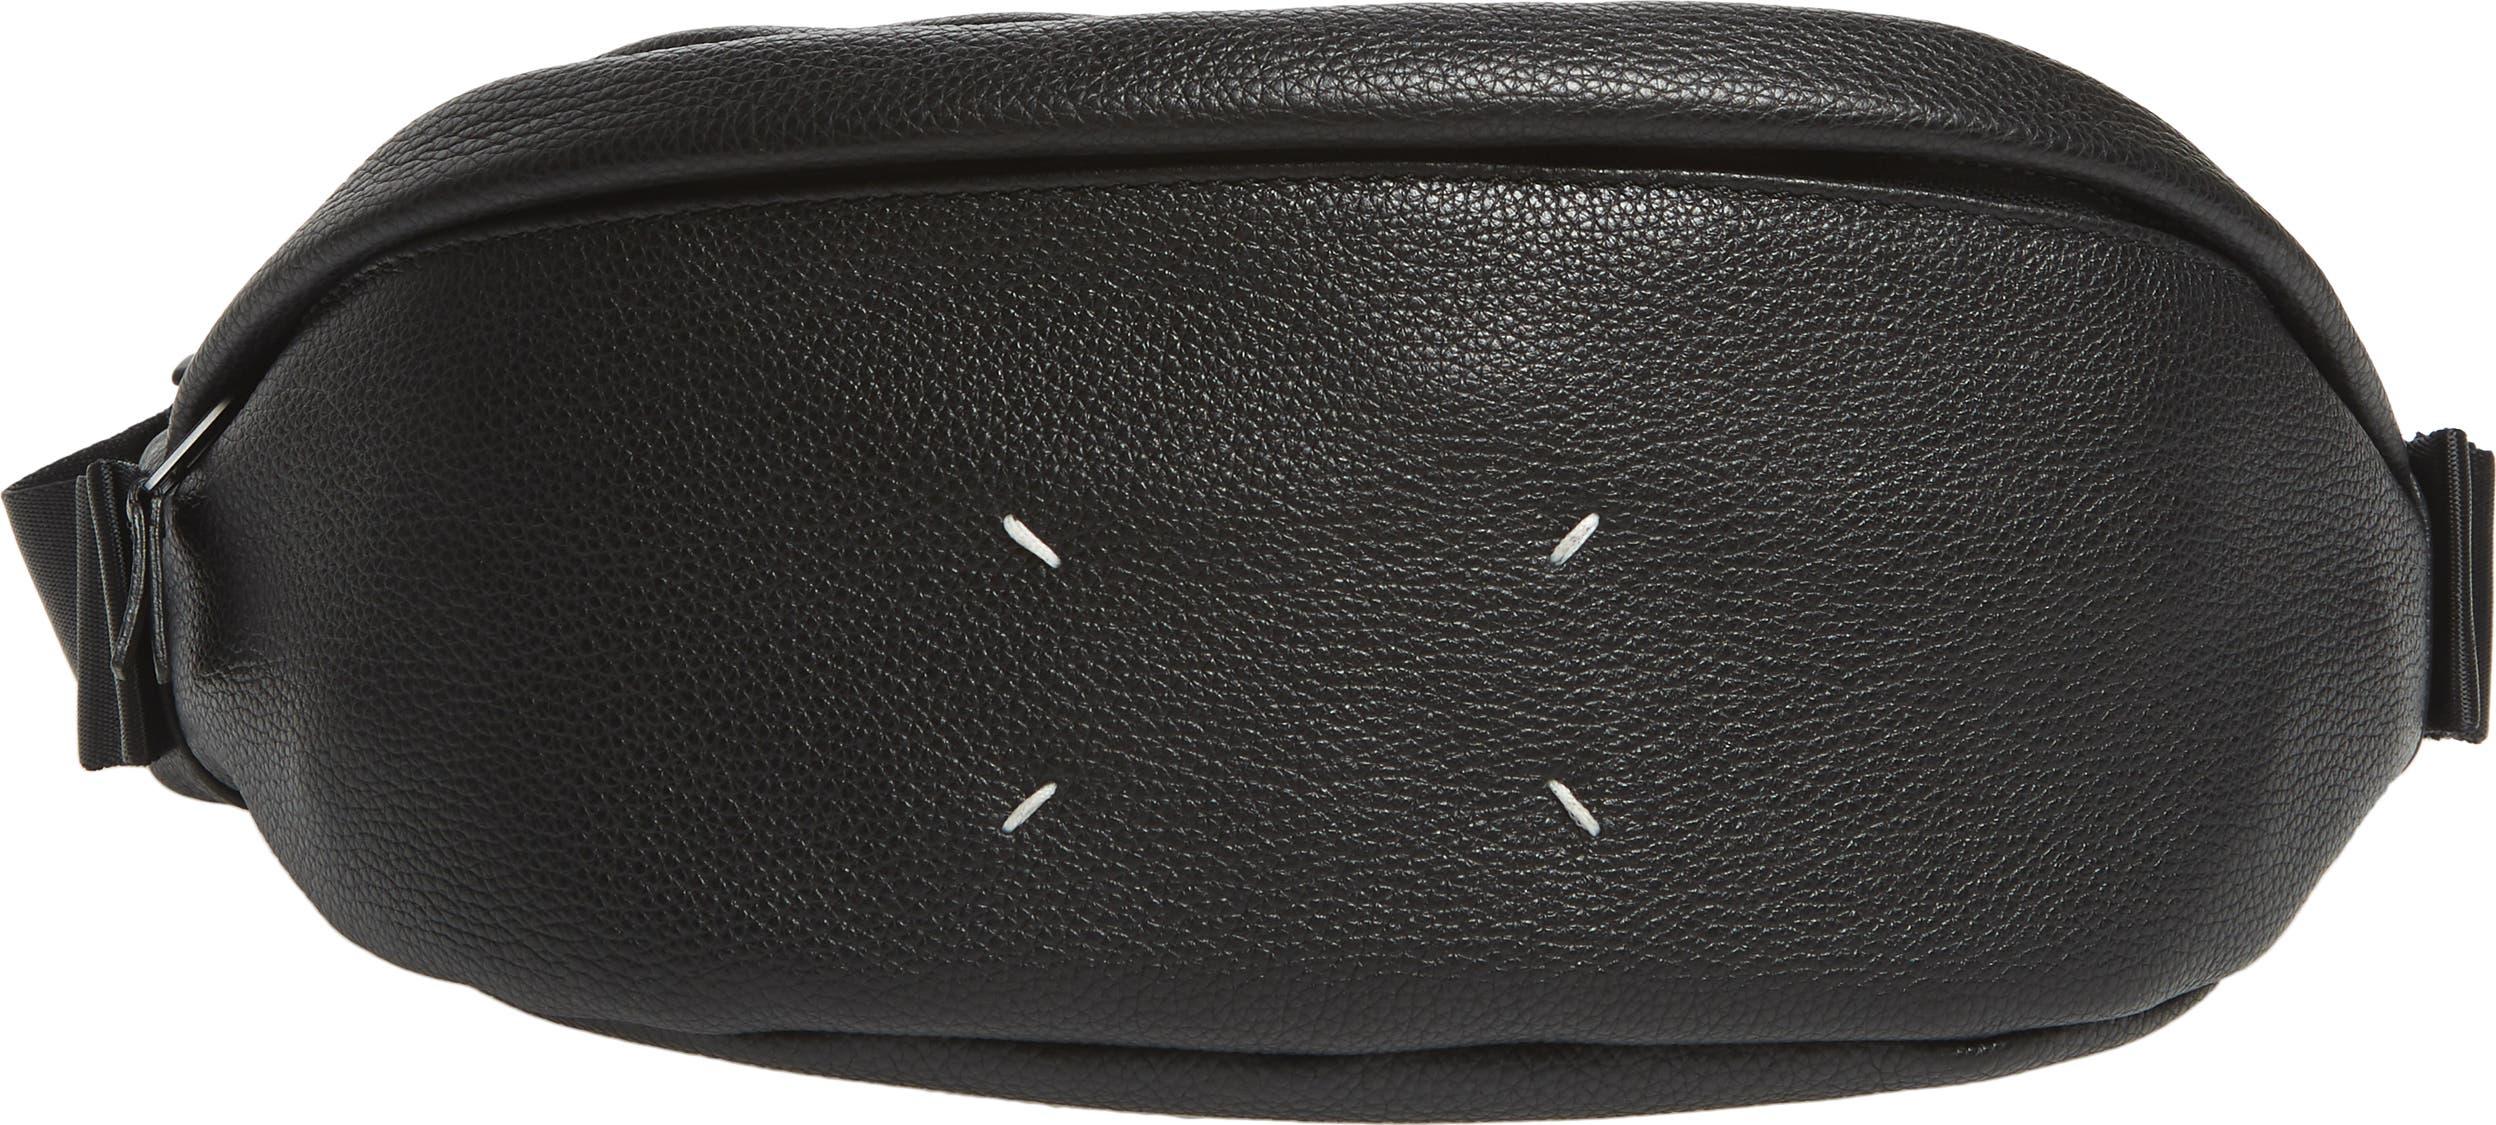 MAISON MARGIELA men Travel Accessories leather luggage name tag White Black